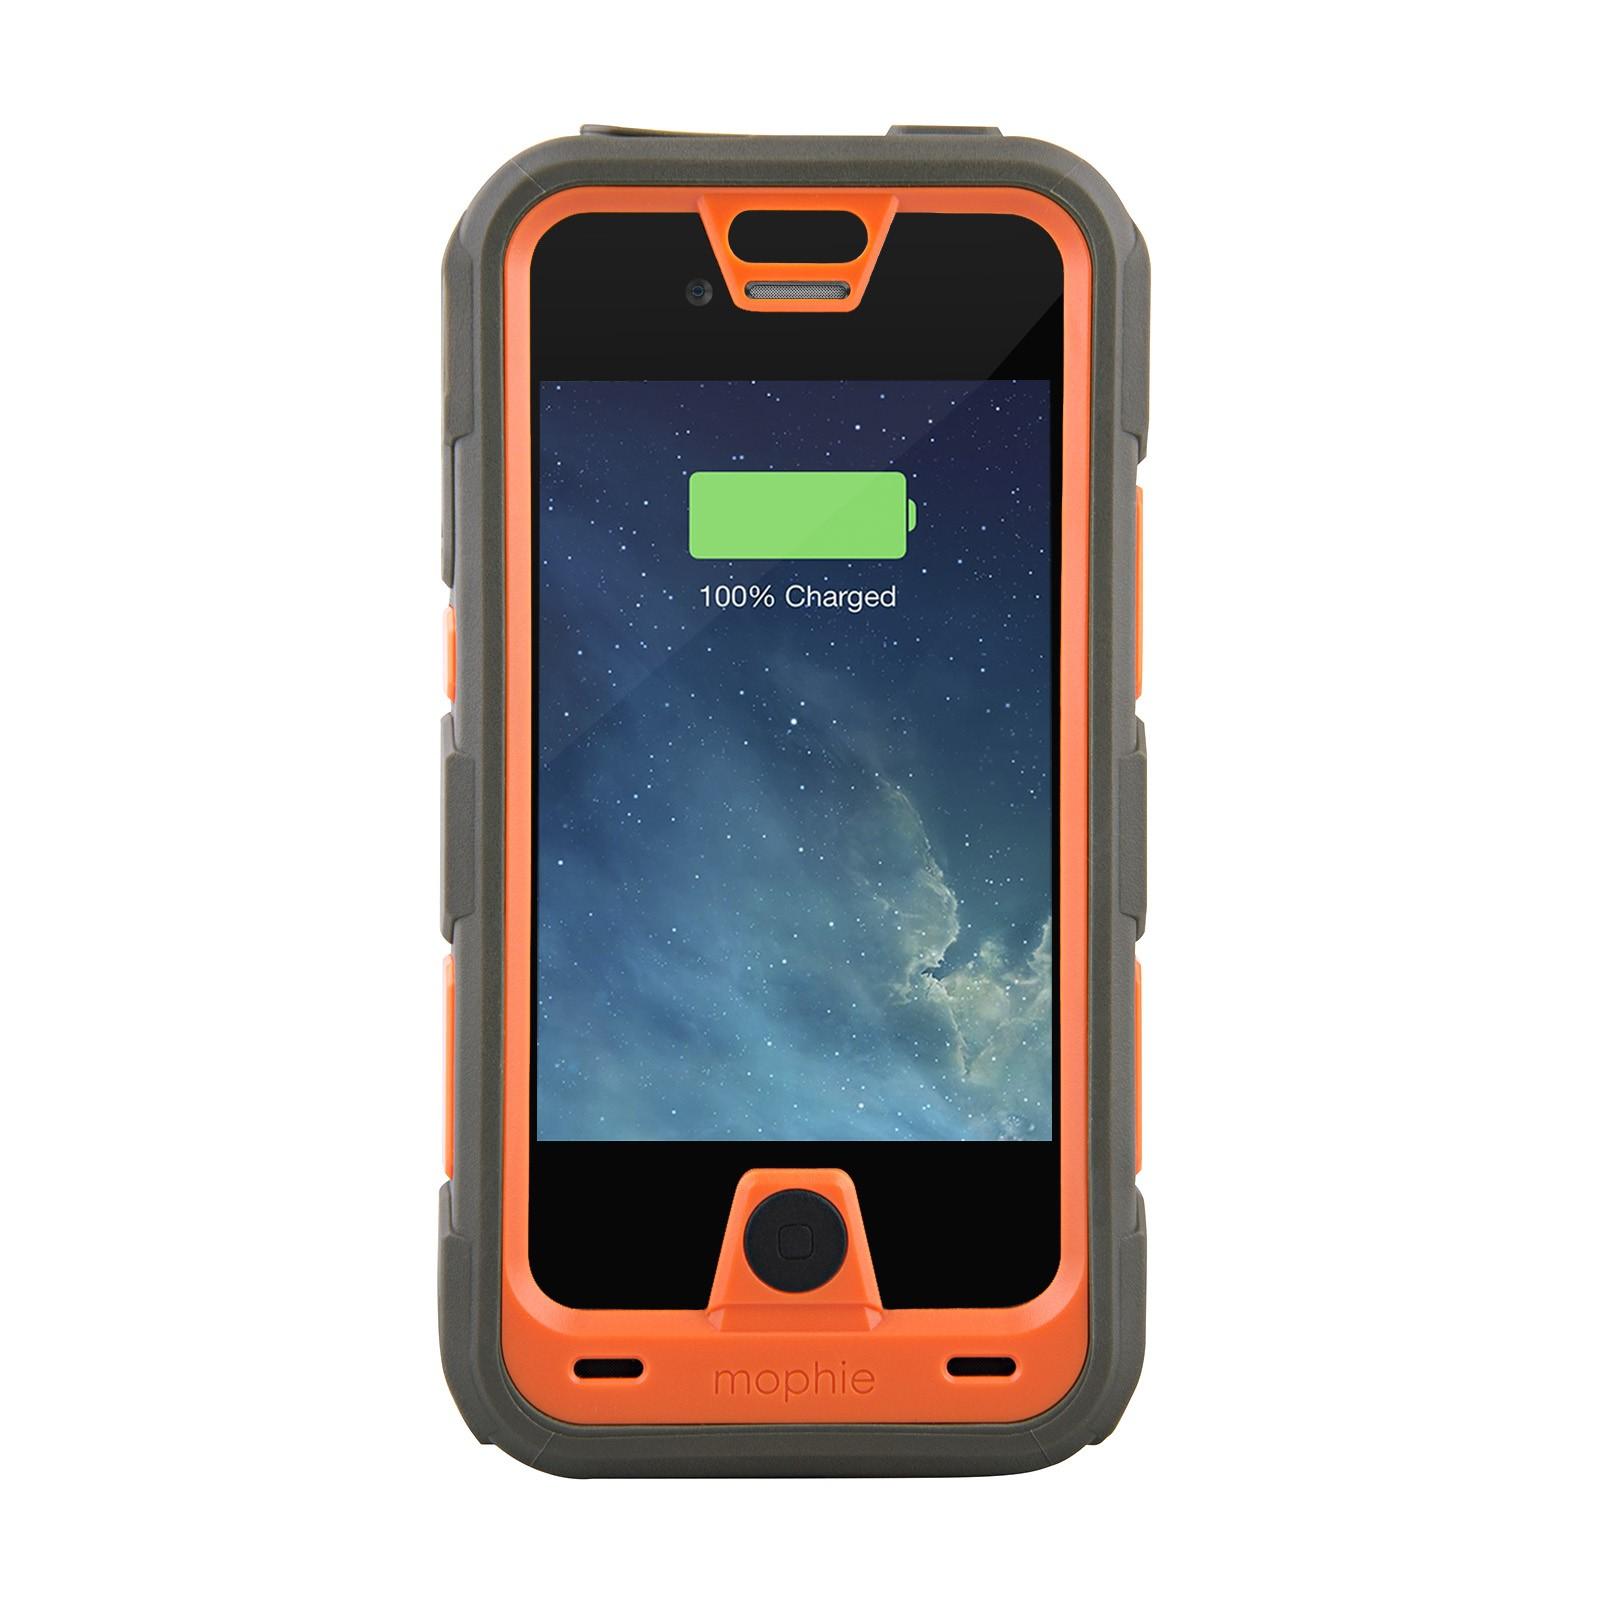 mophie juice pack pro rugged water resistant battery case. Black Bedroom Furniture Sets. Home Design Ideas